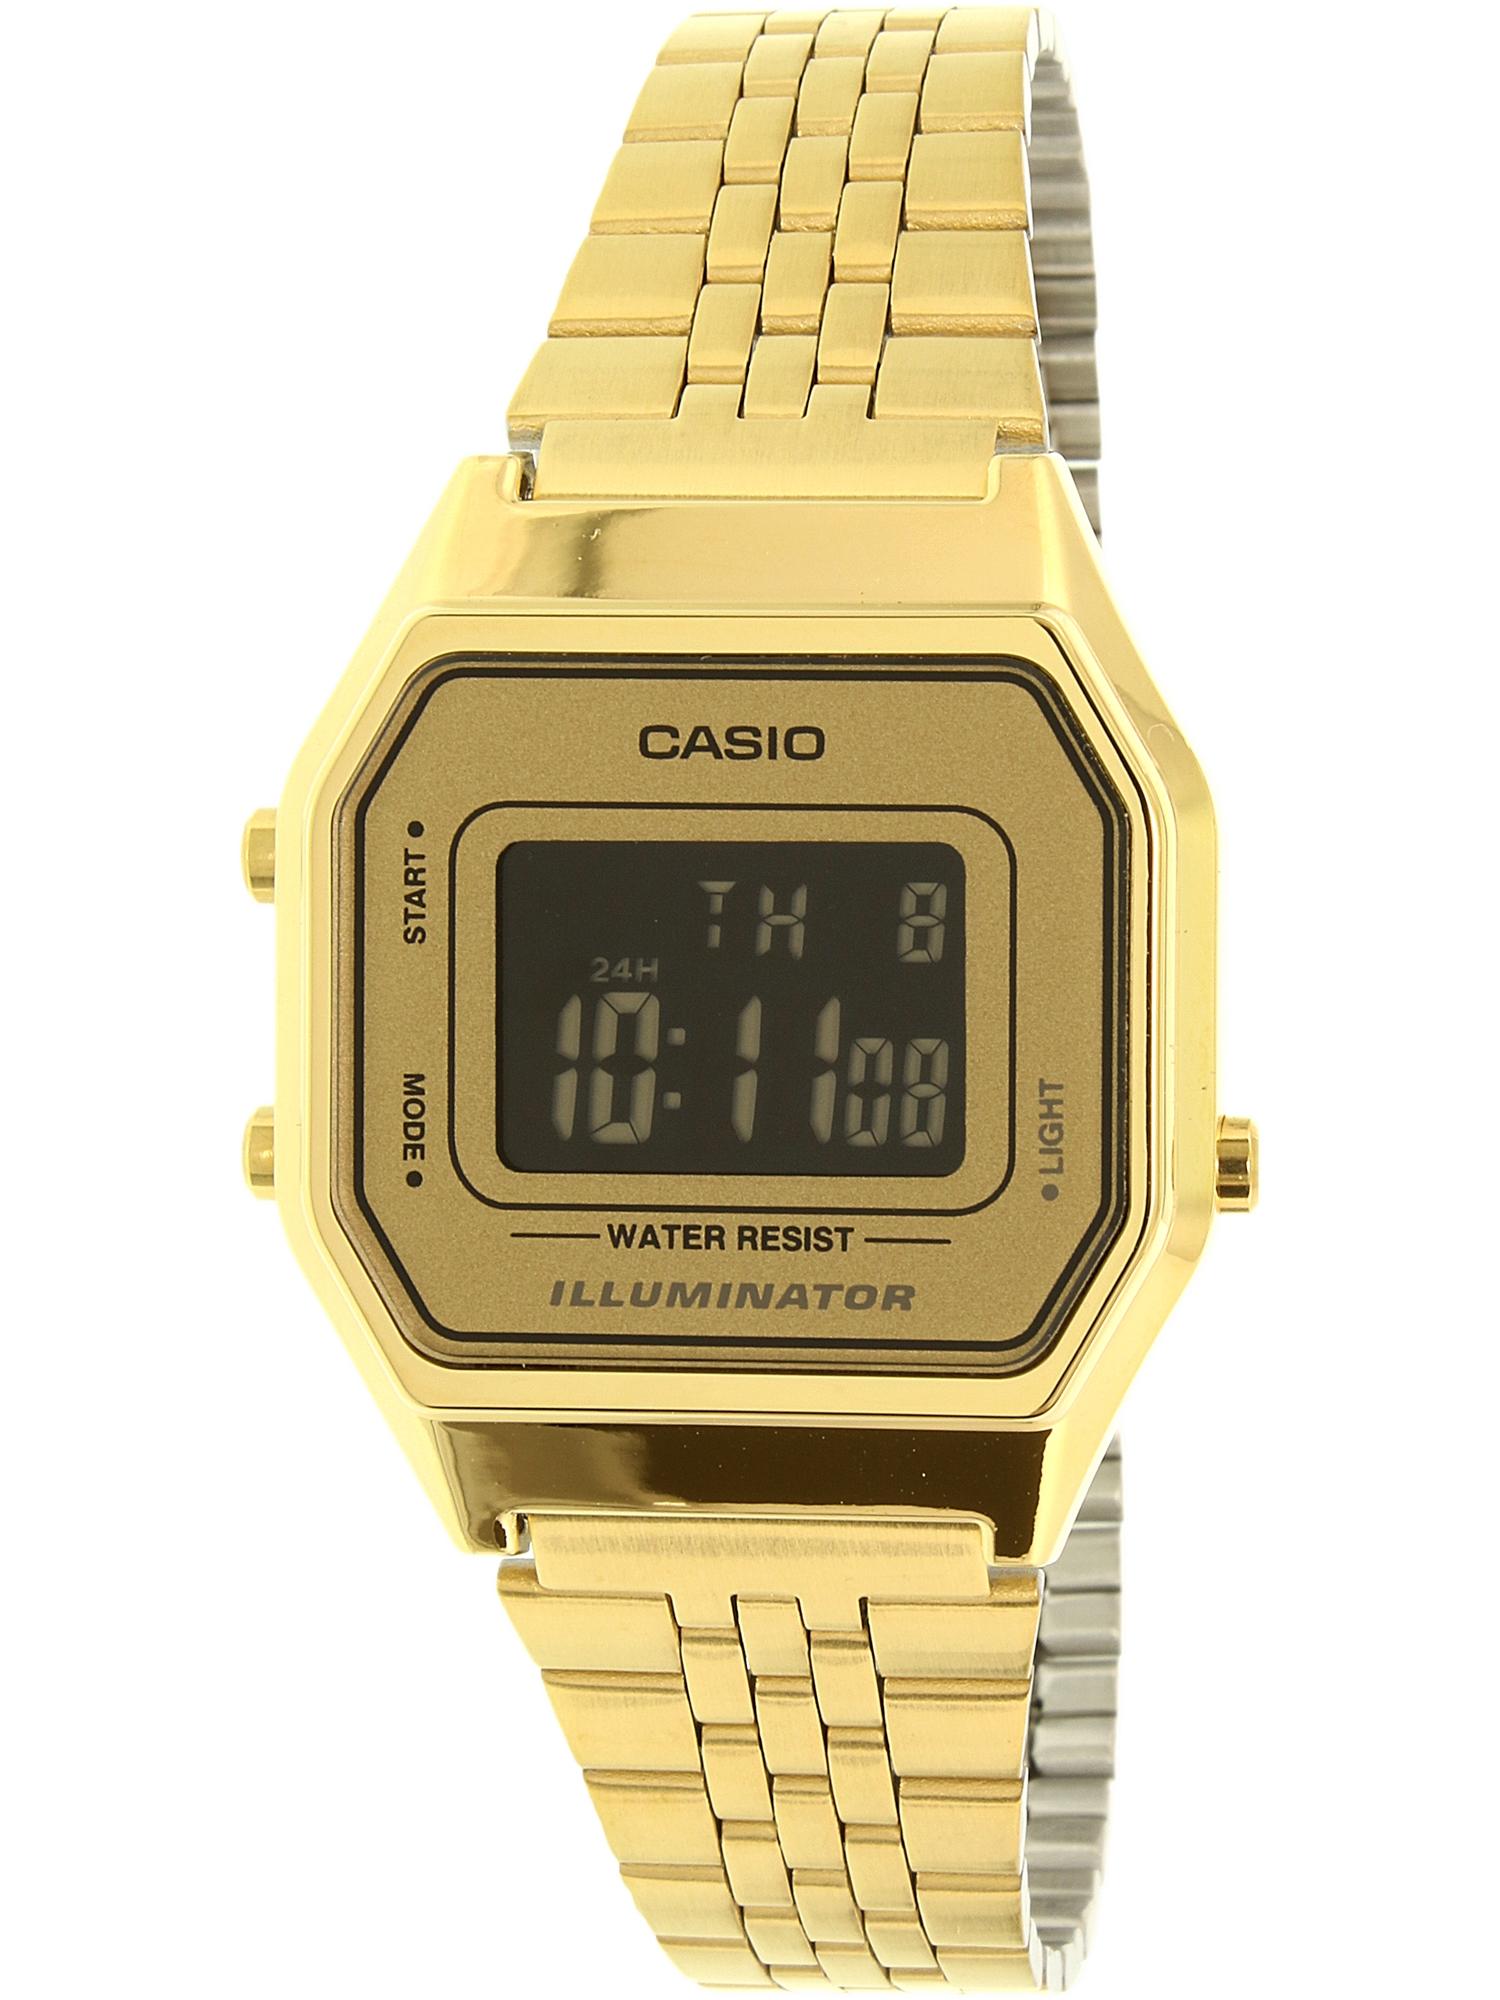 Gold- Tone Digital Retro Ladies' Watch, LA680WGA-9B